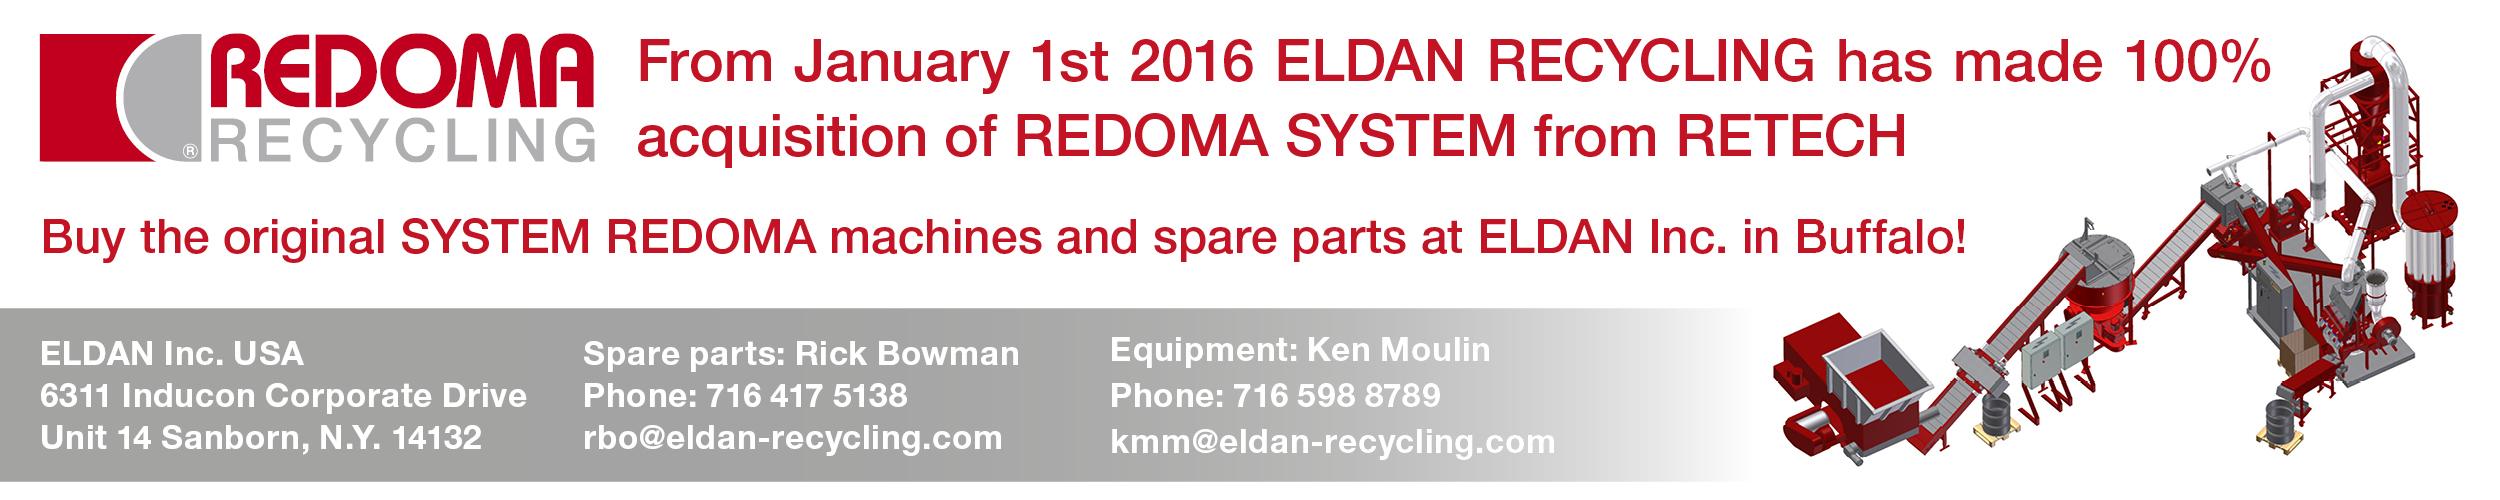 Eldan-Redoma